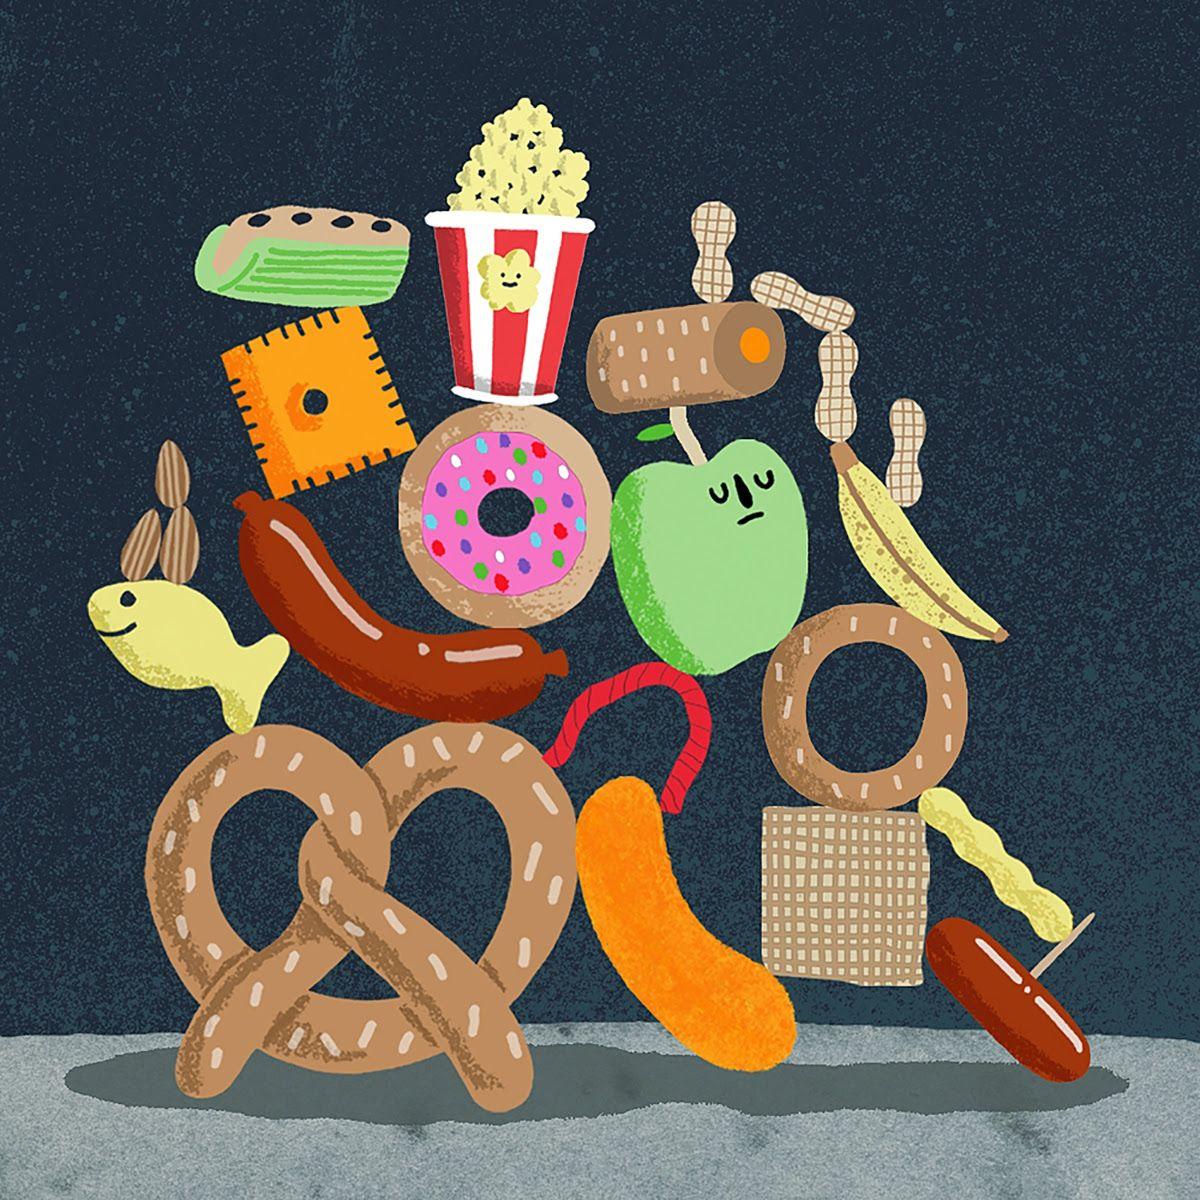 illustration of food Illustration, Graphic design